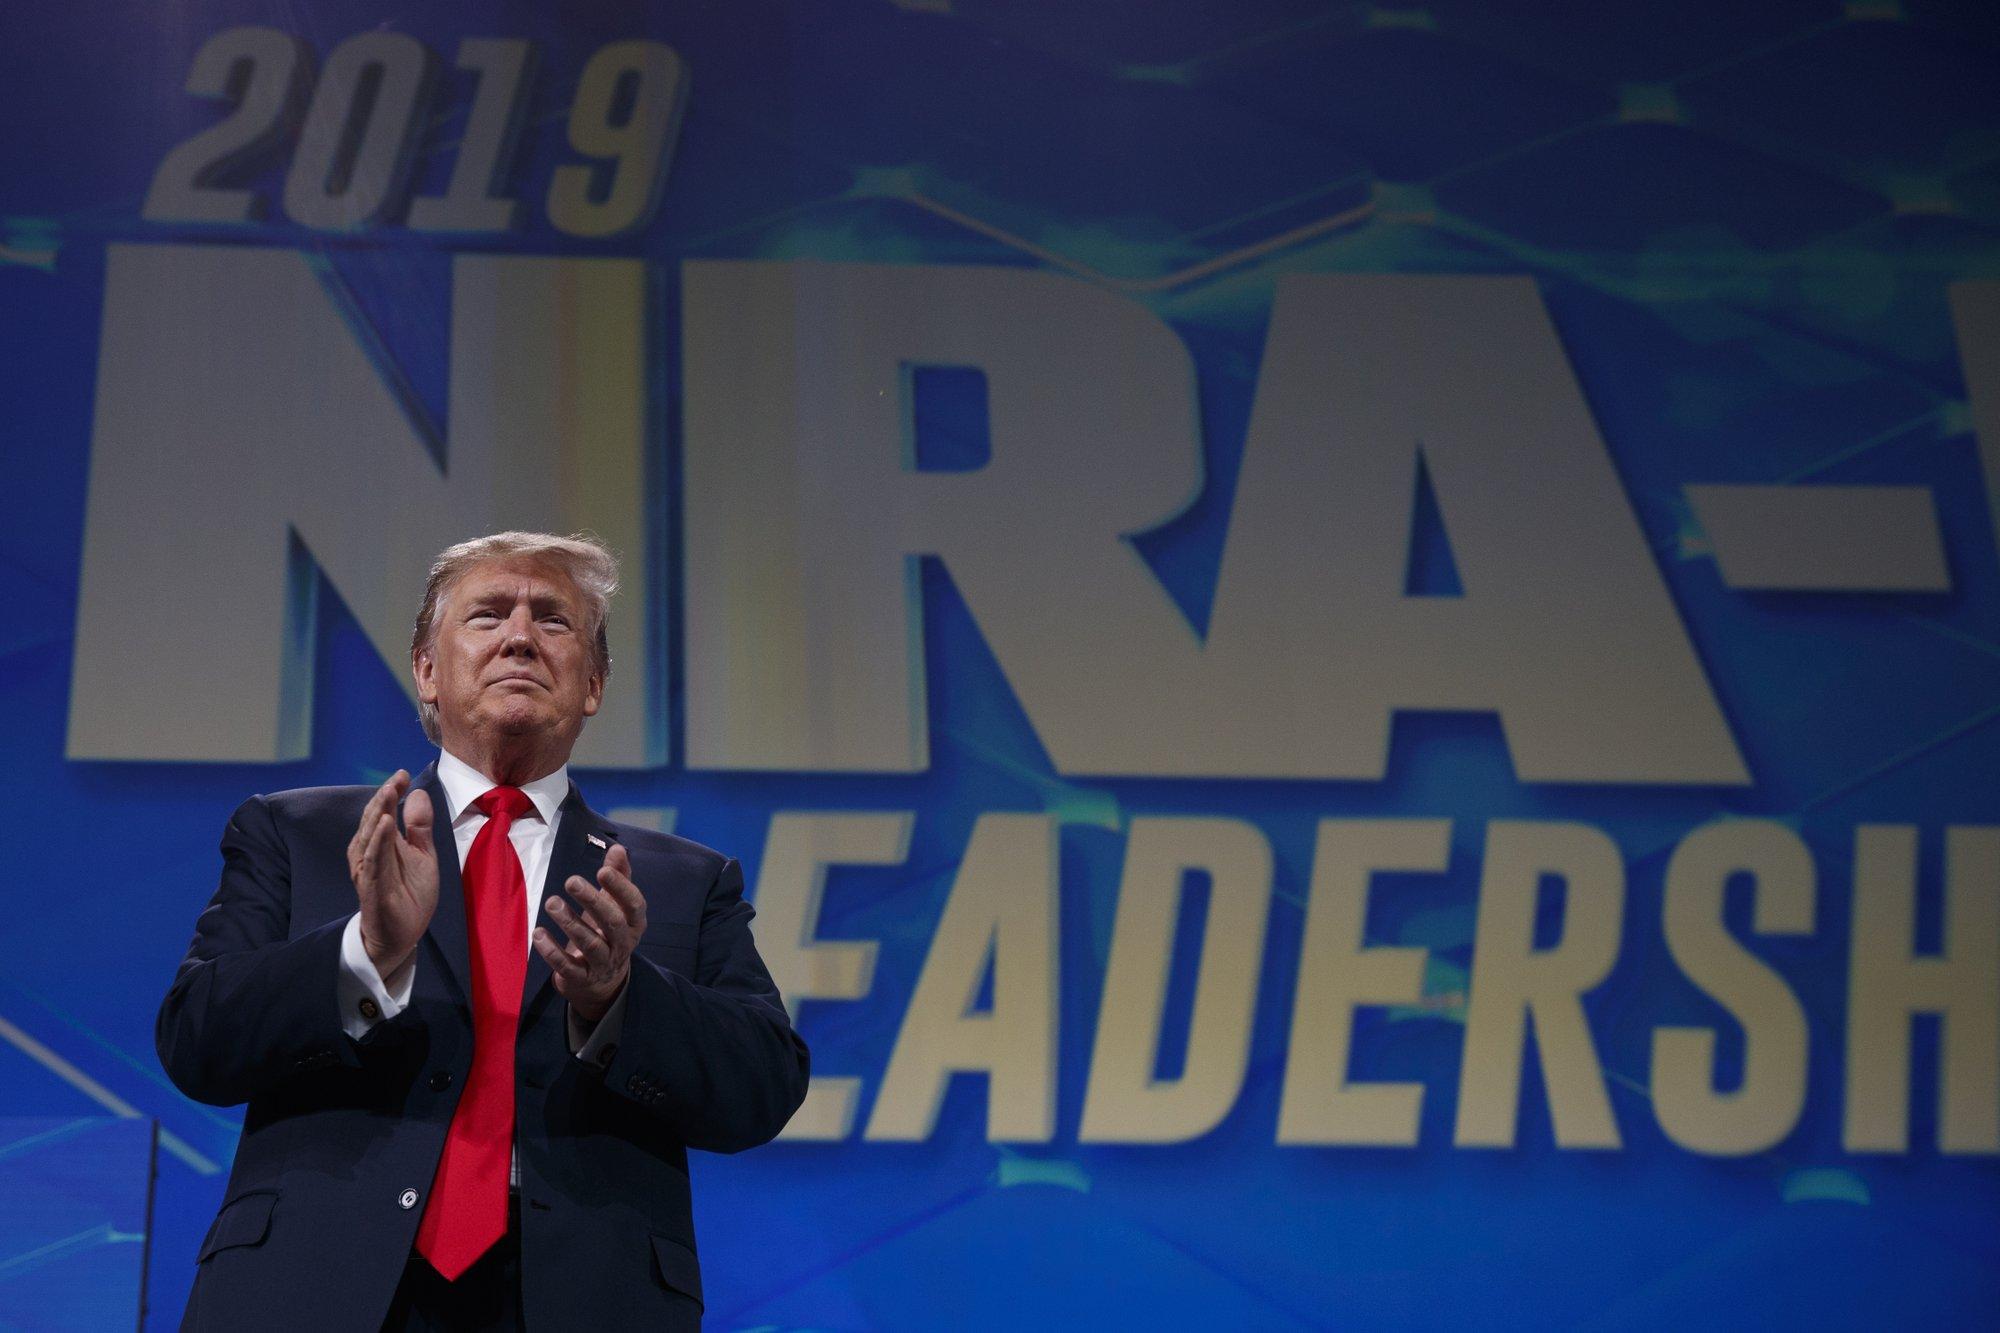 Trump NRA_1556312879402.jpeg.jpg